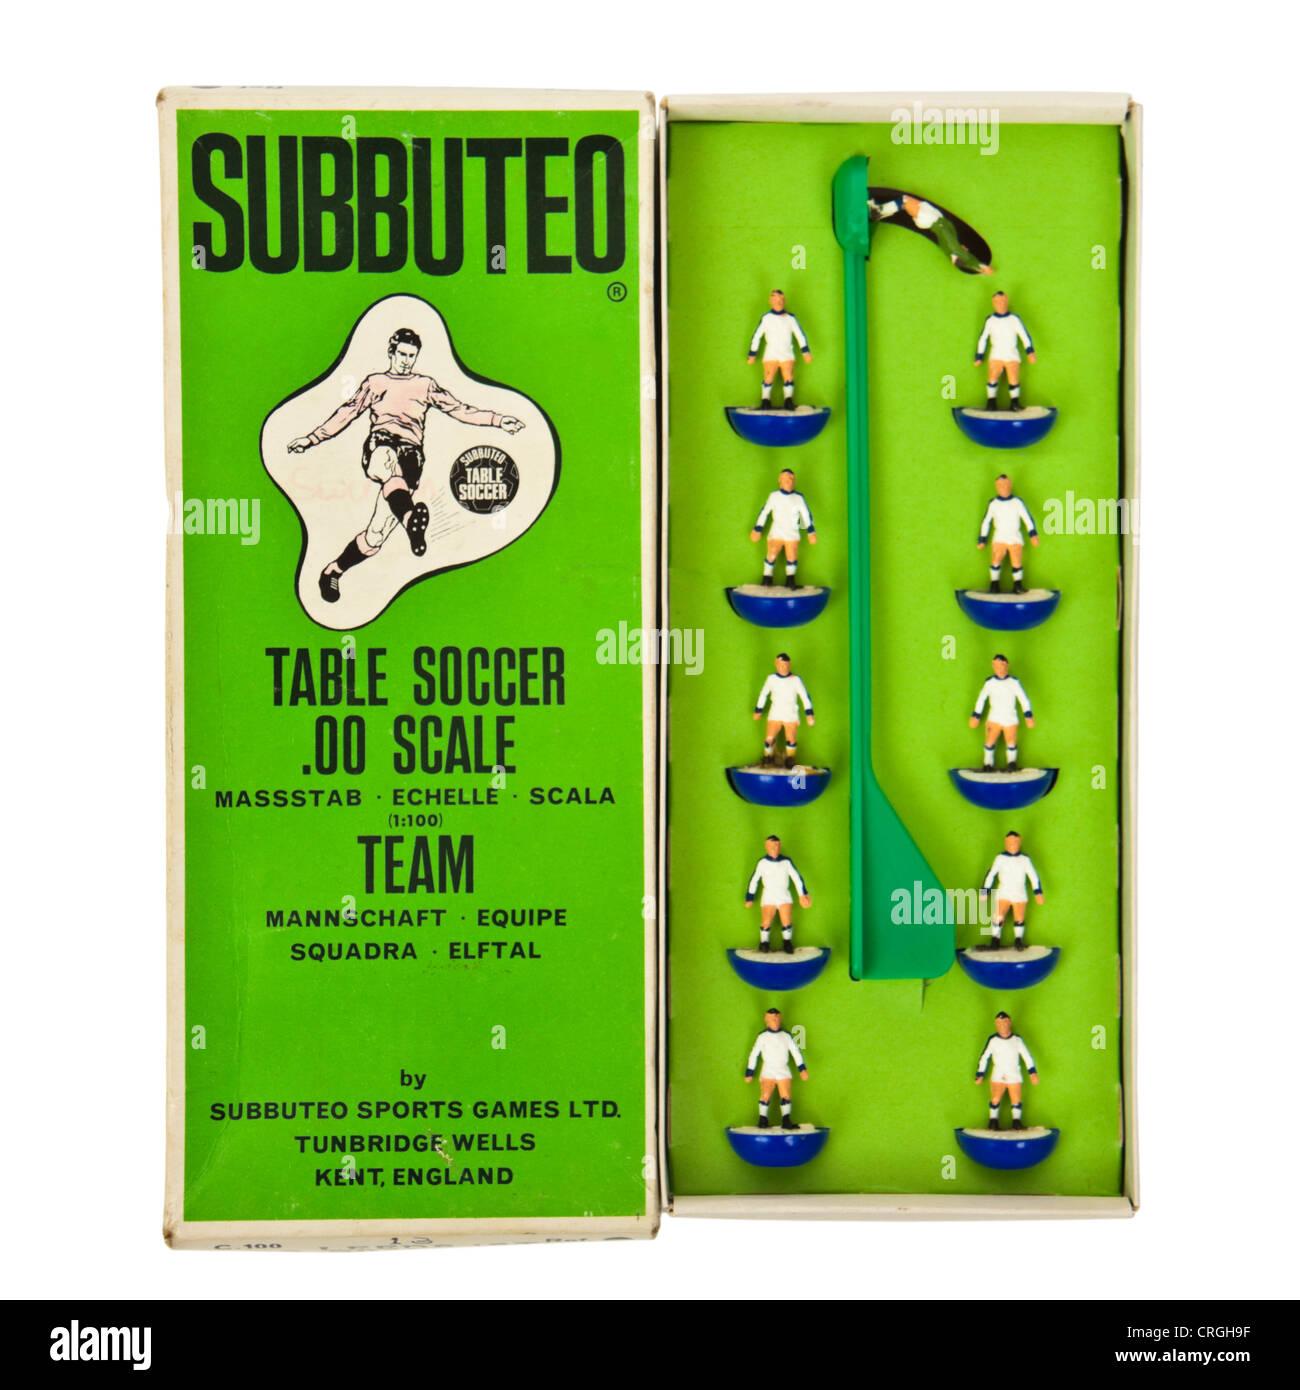 1970's Subbuteo football team - Leeds United (1st) heavyweight team (207) - Stock Image